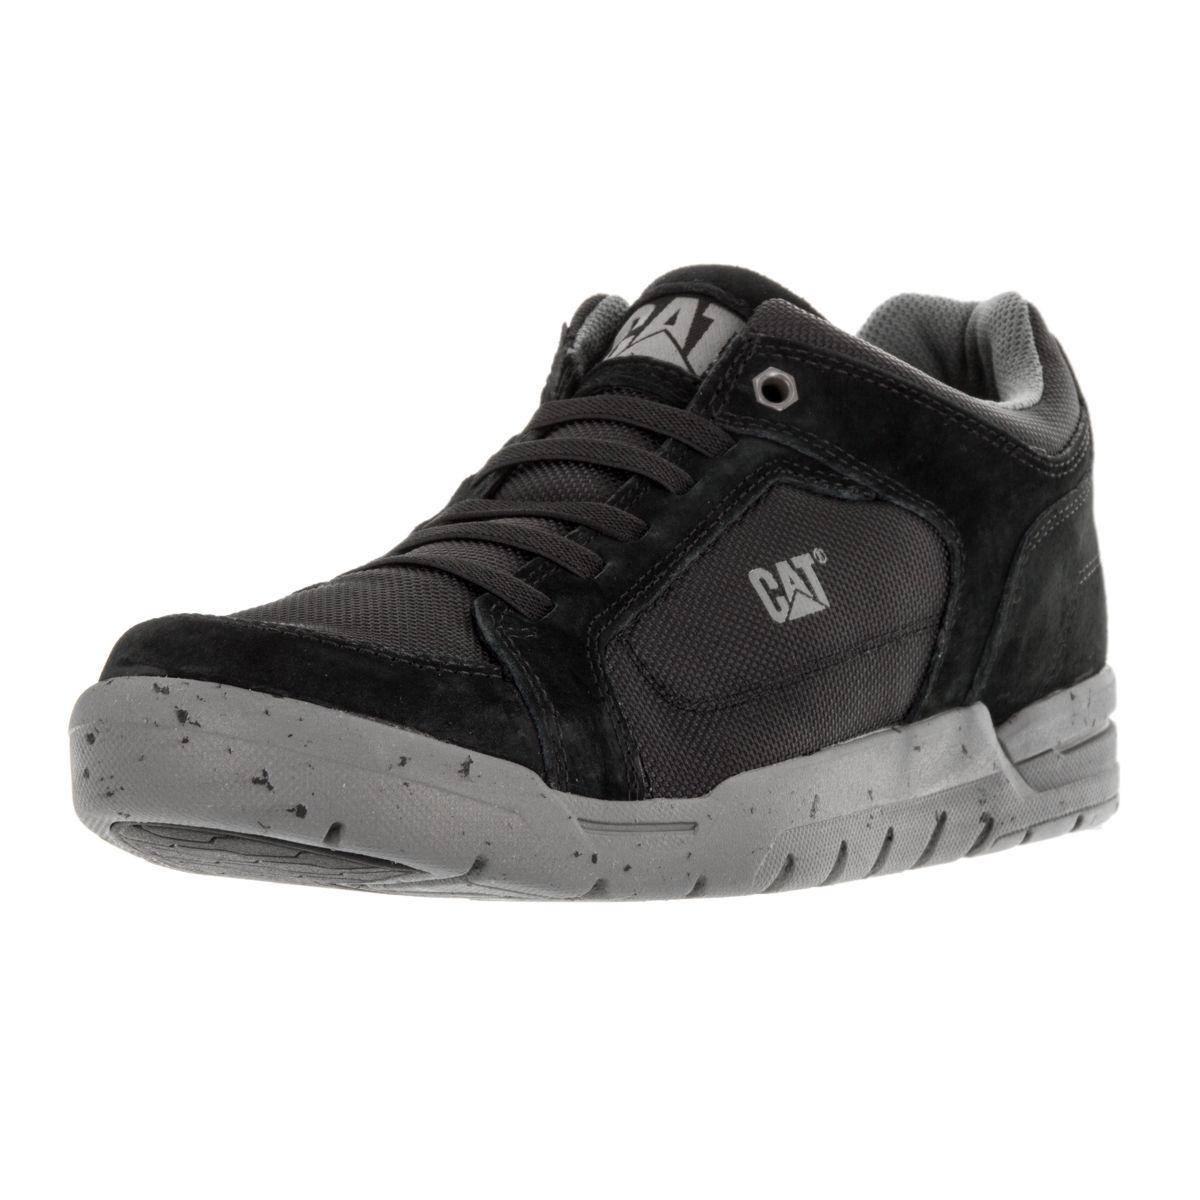 e2011e666 Caterpillar Men s Indent Black Casual Shoe